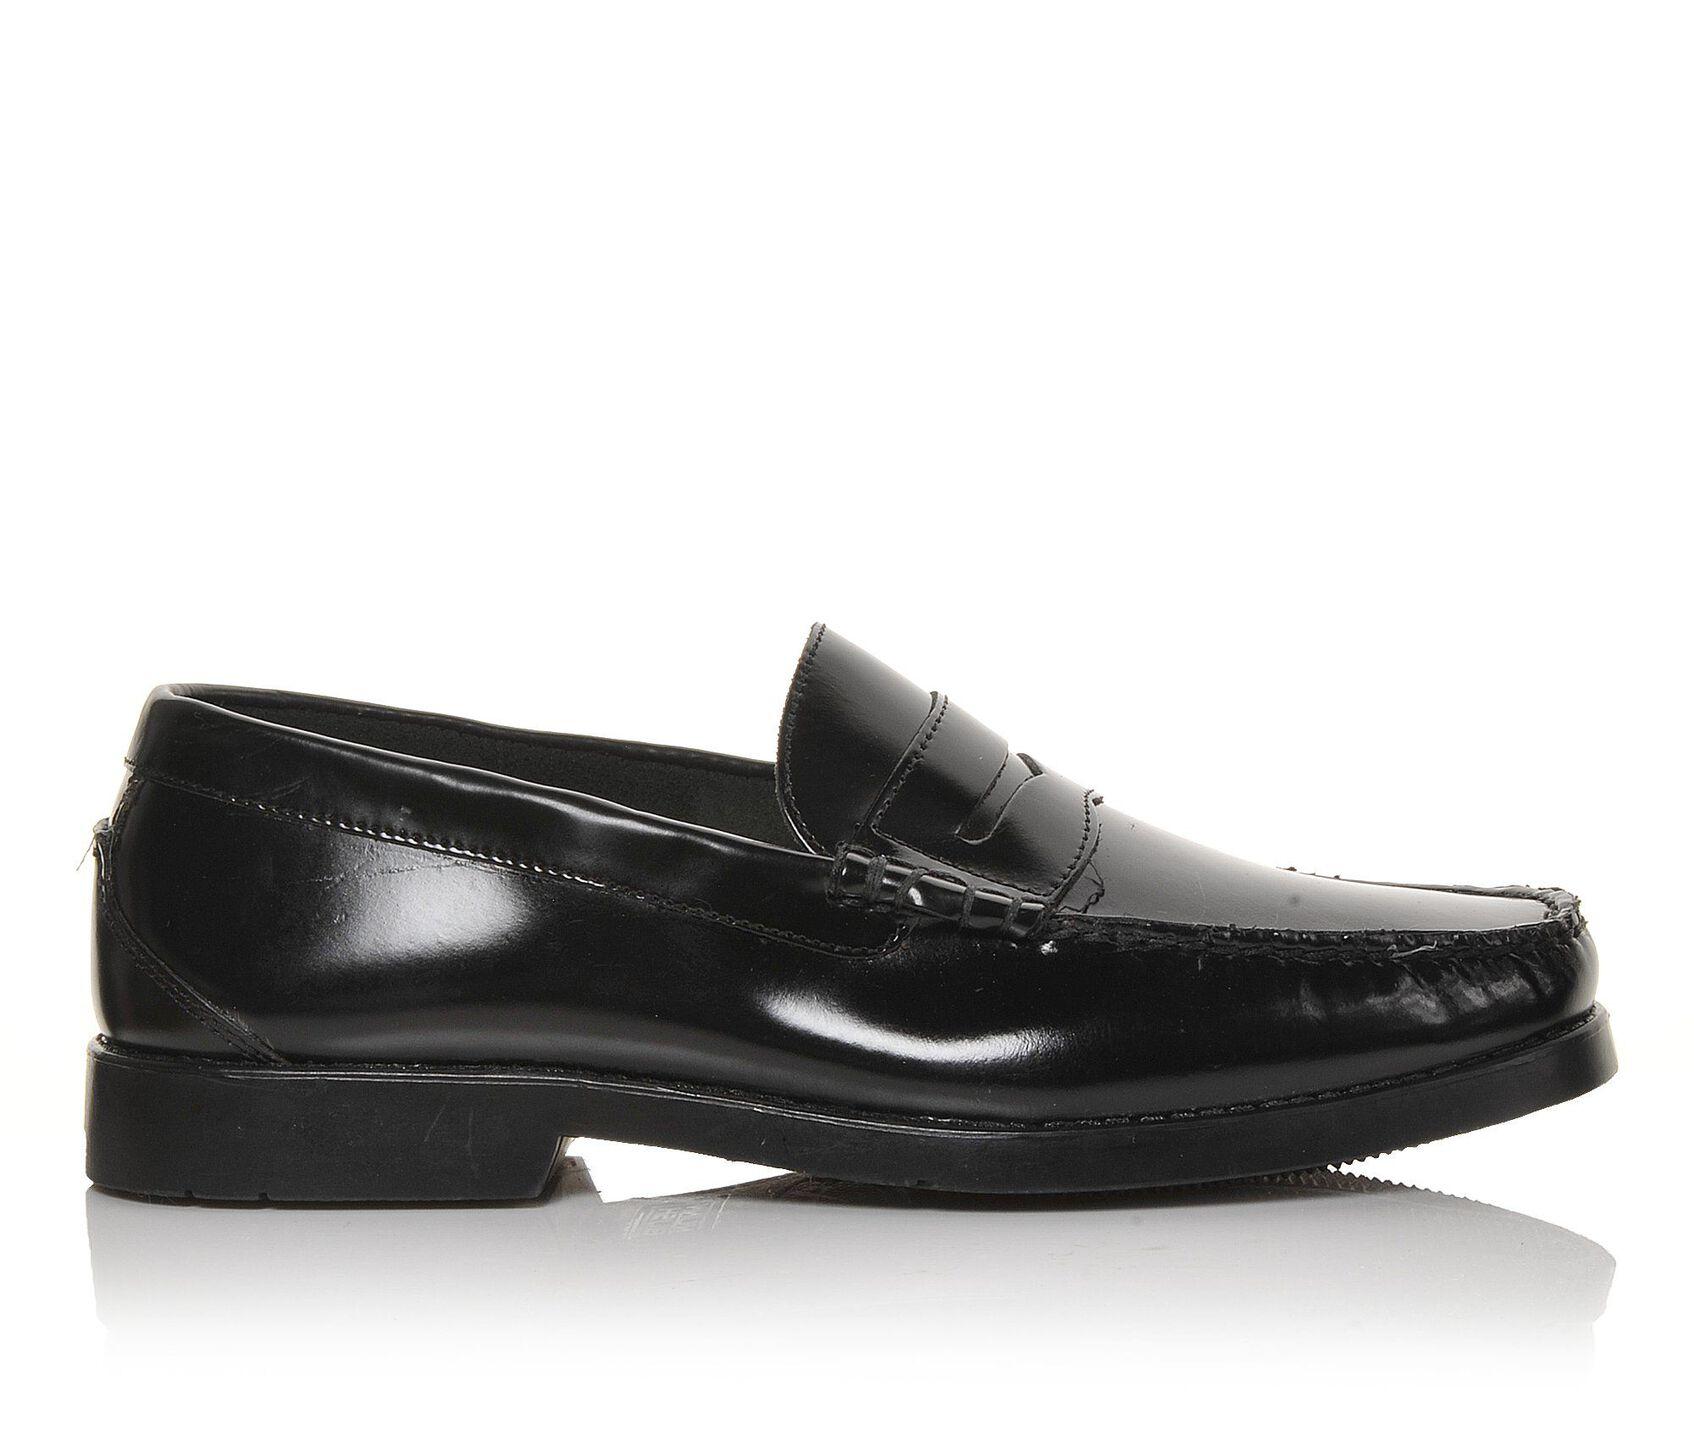 db94a328587 Men s Nunn Bush Baker Loafers